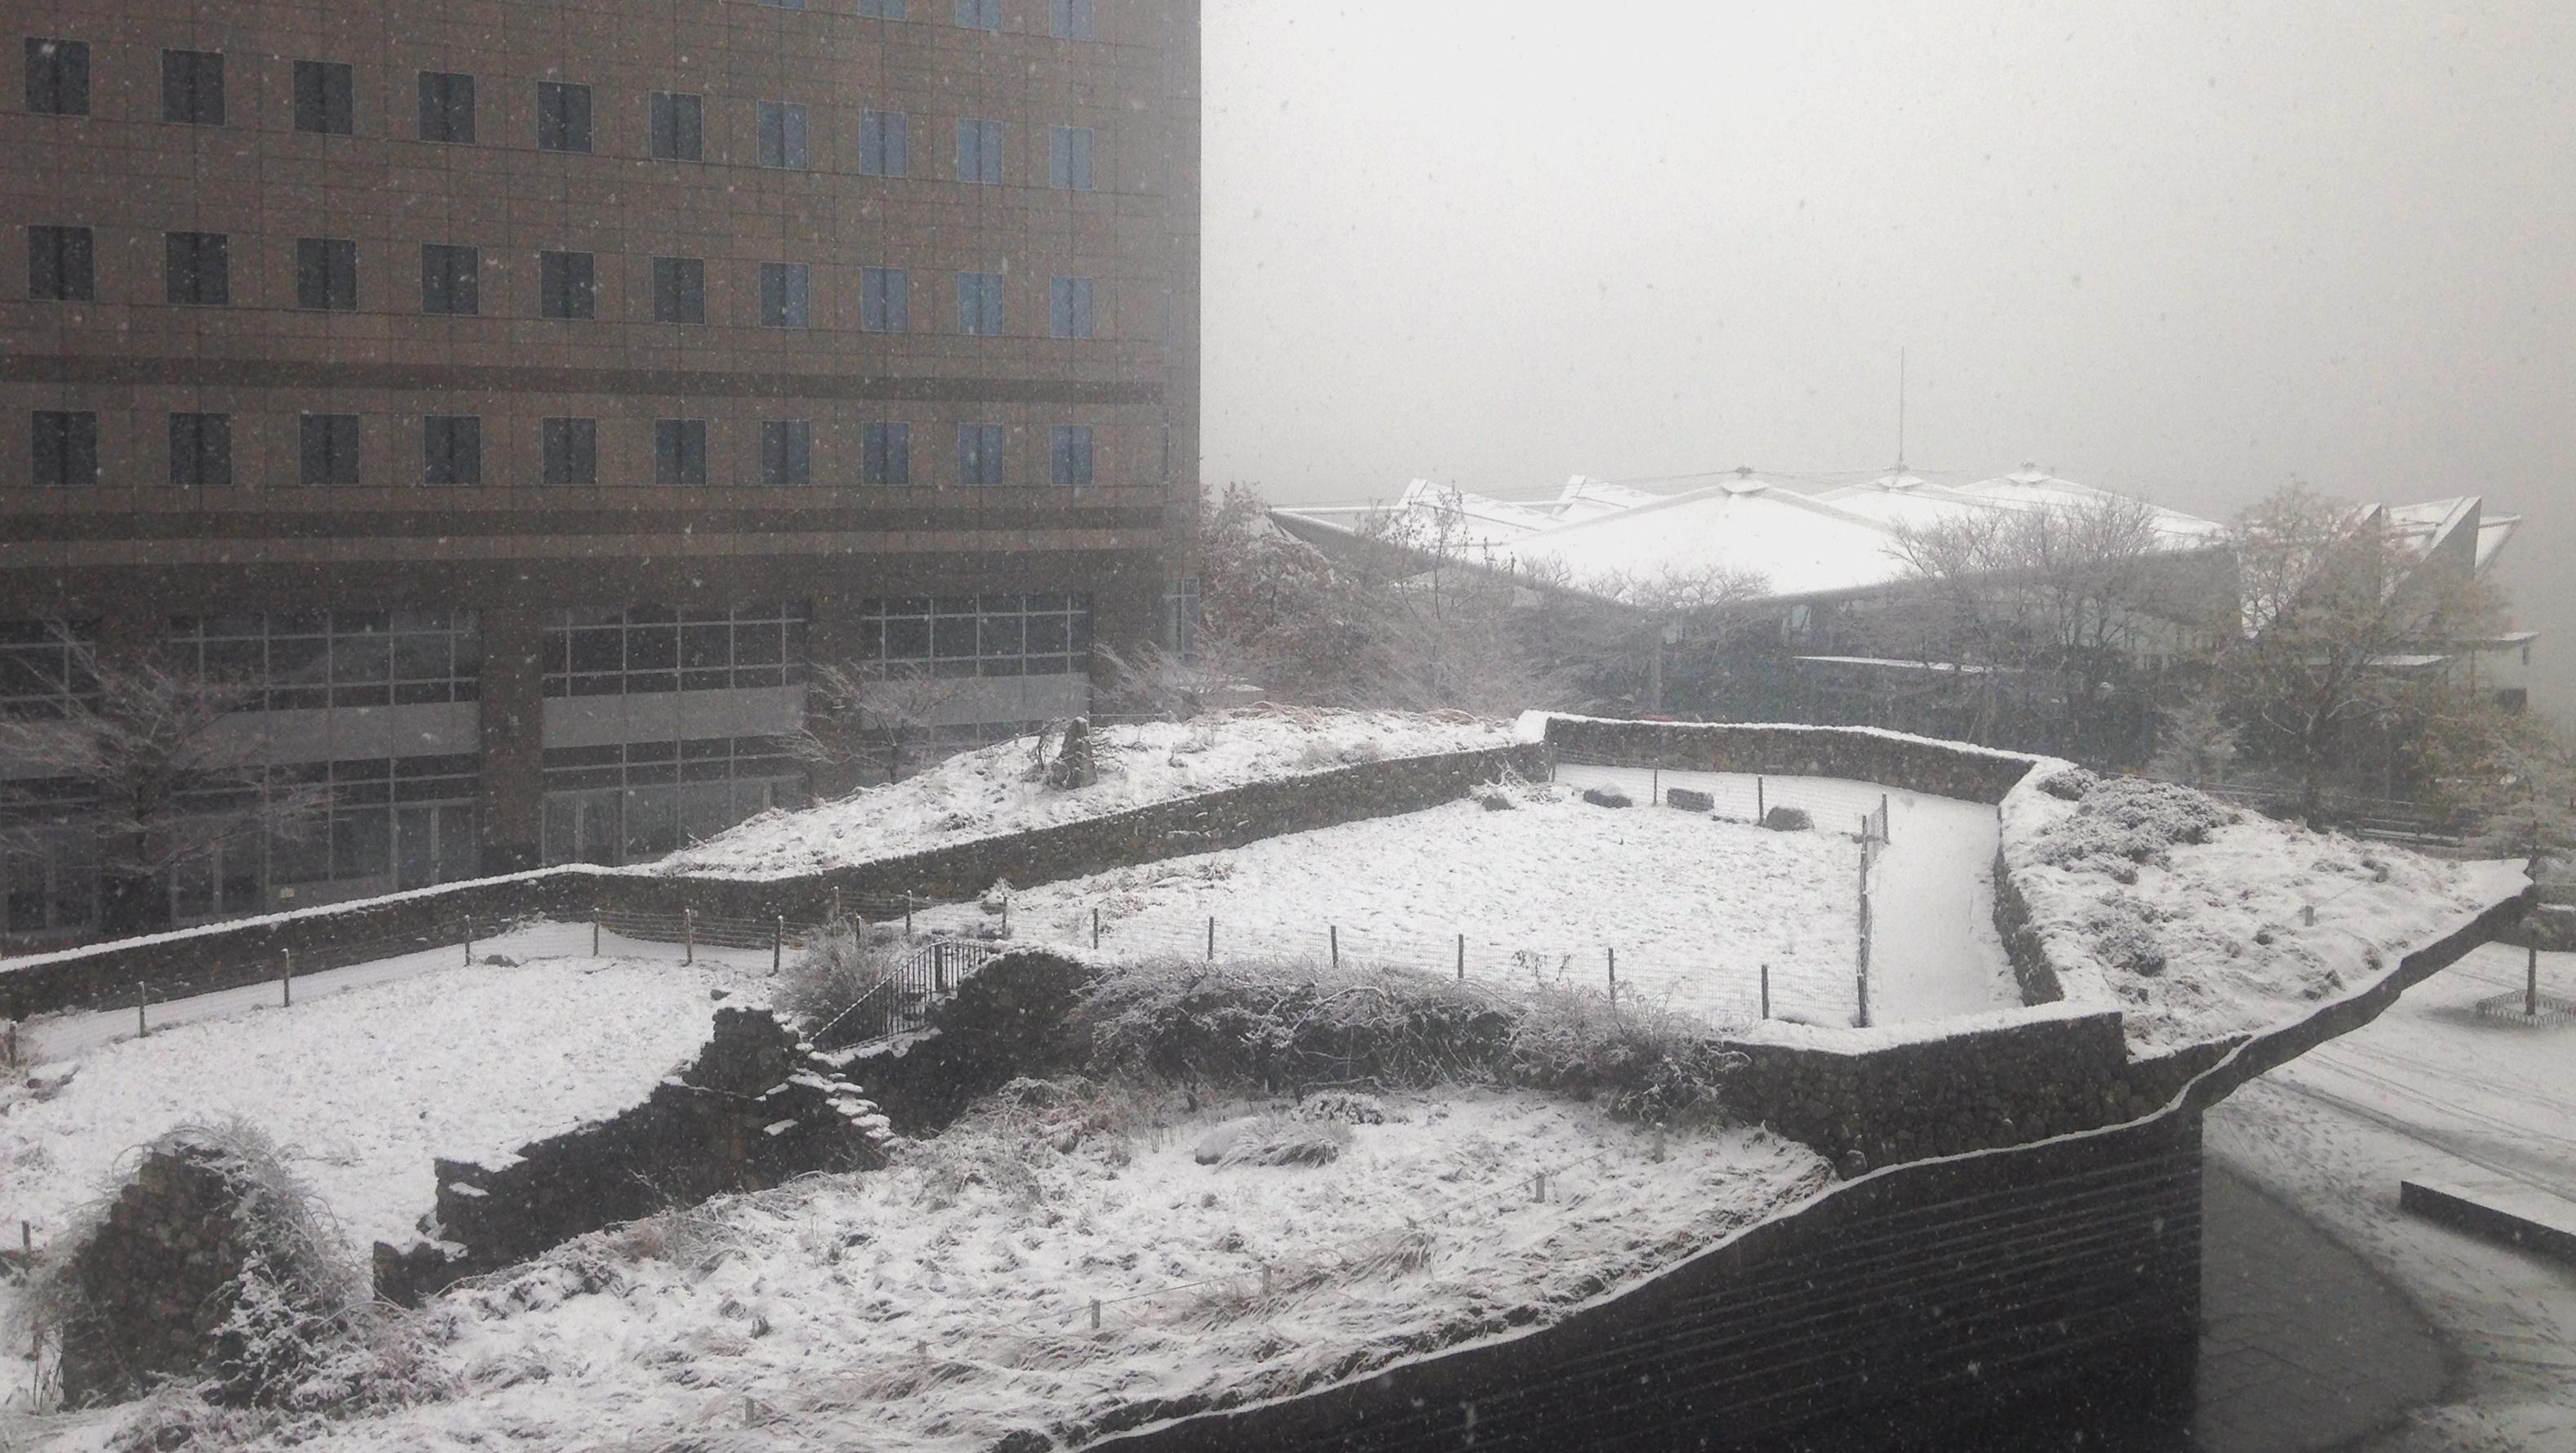 Irish Memorial snow 12-10-2013